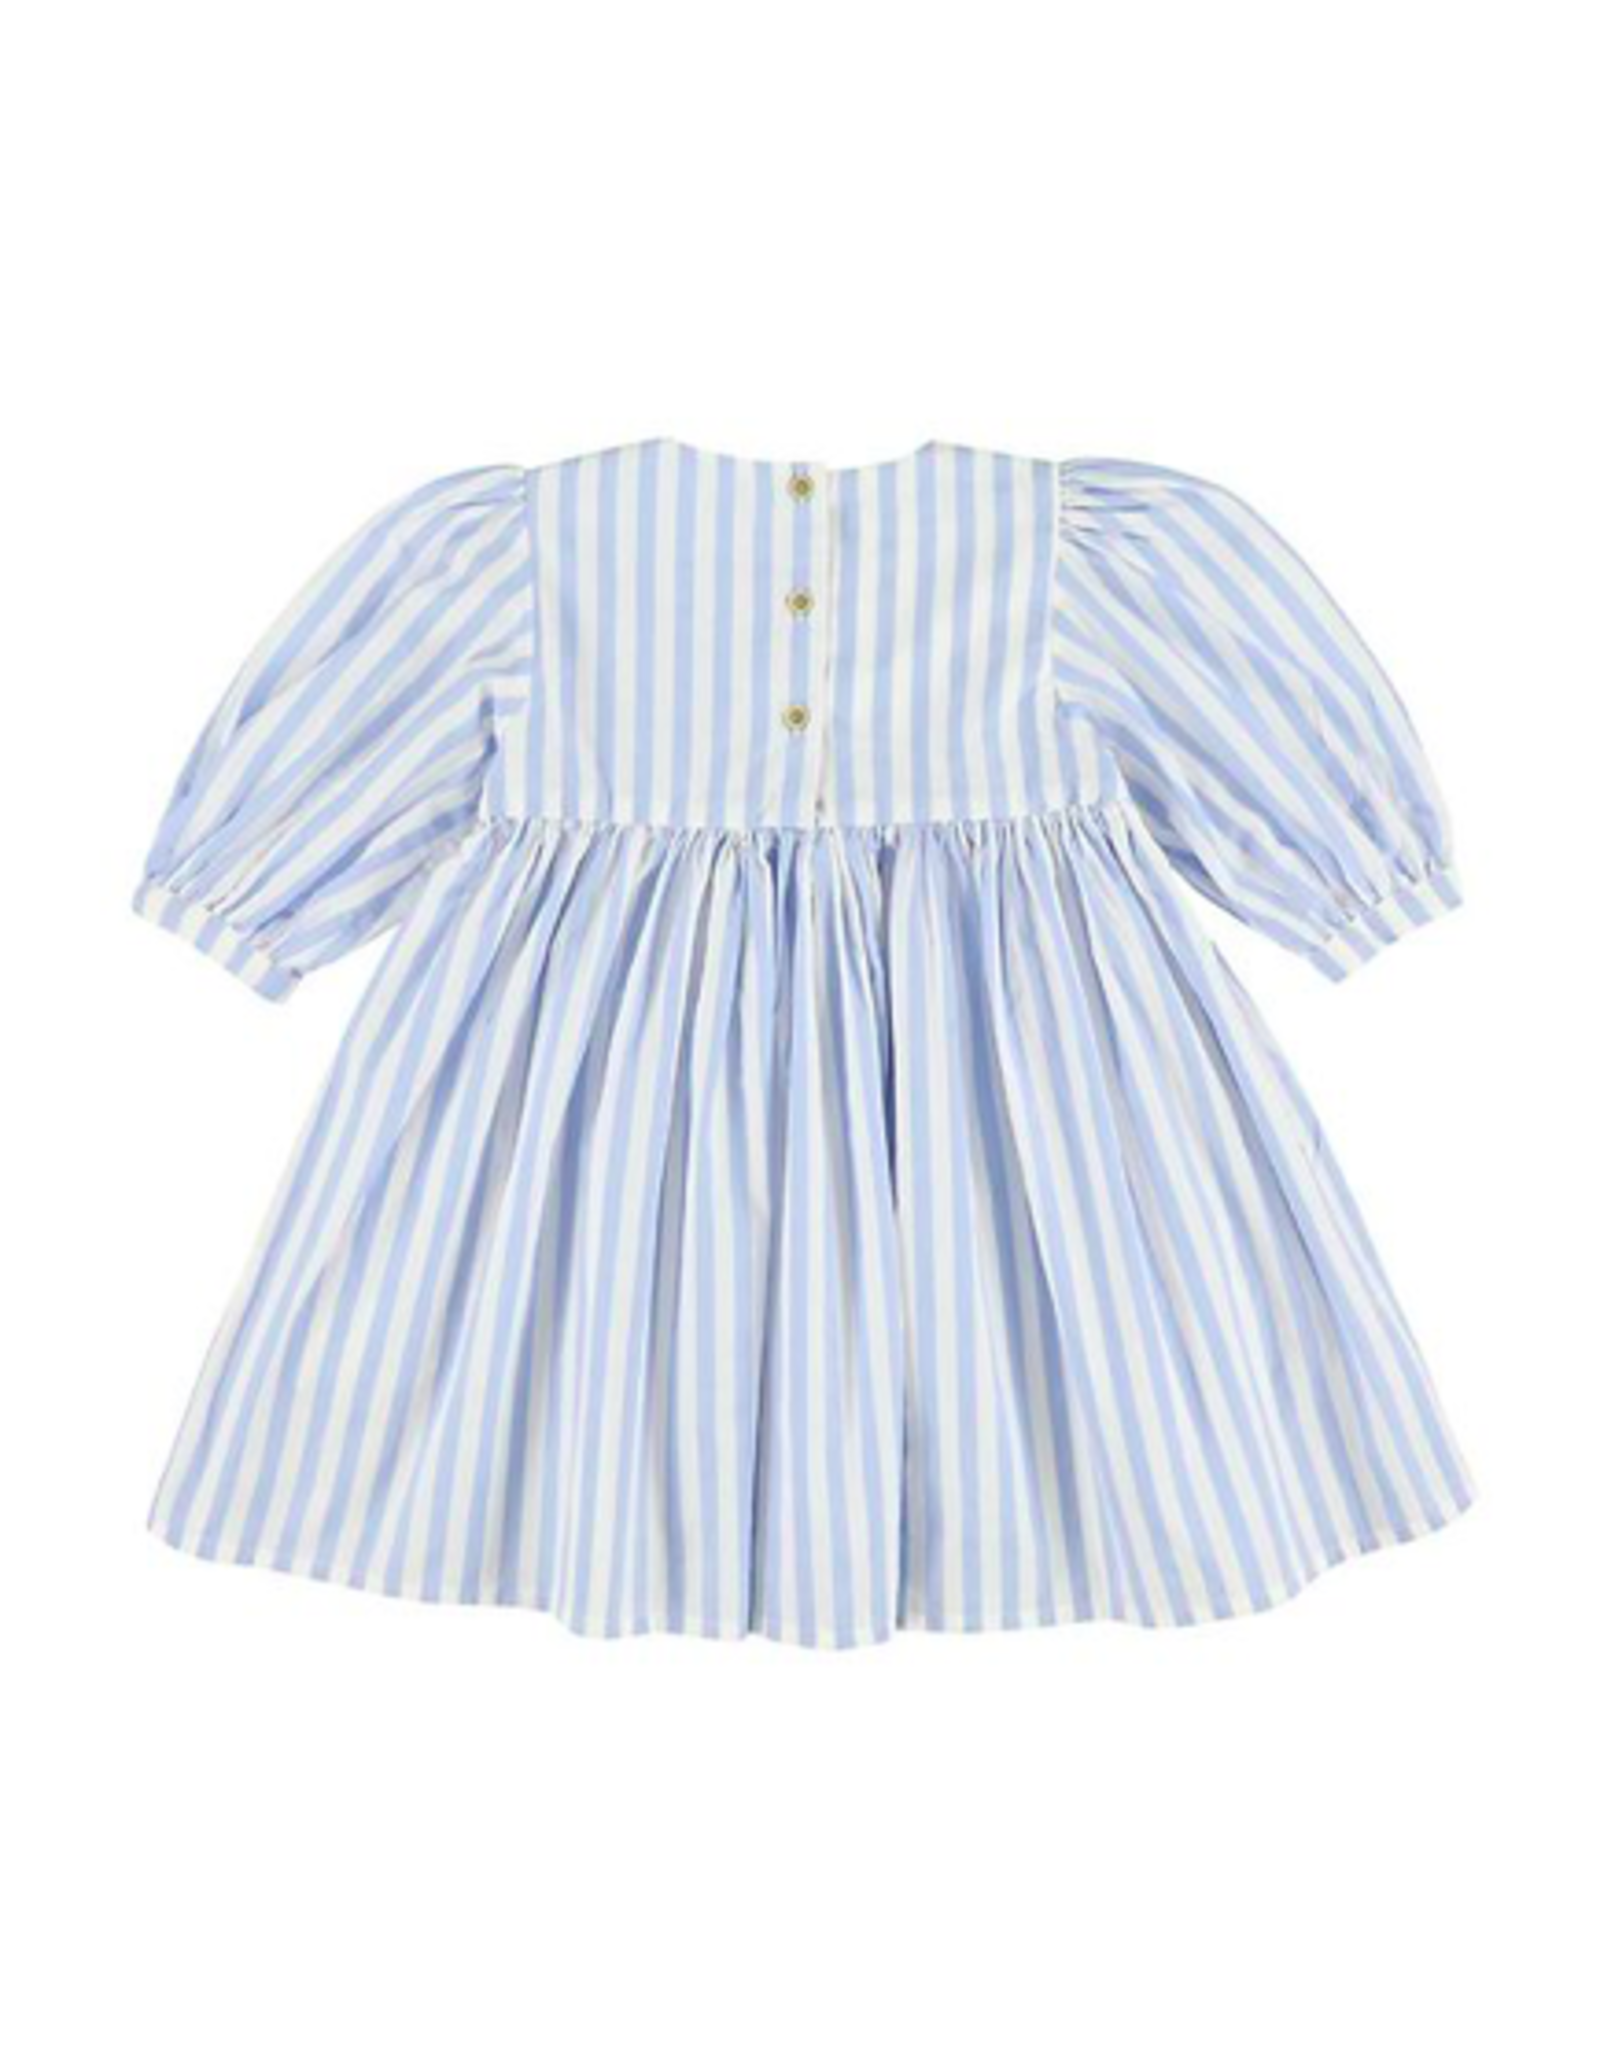 Morley Morley SS21 Noa Nice Lavender dress